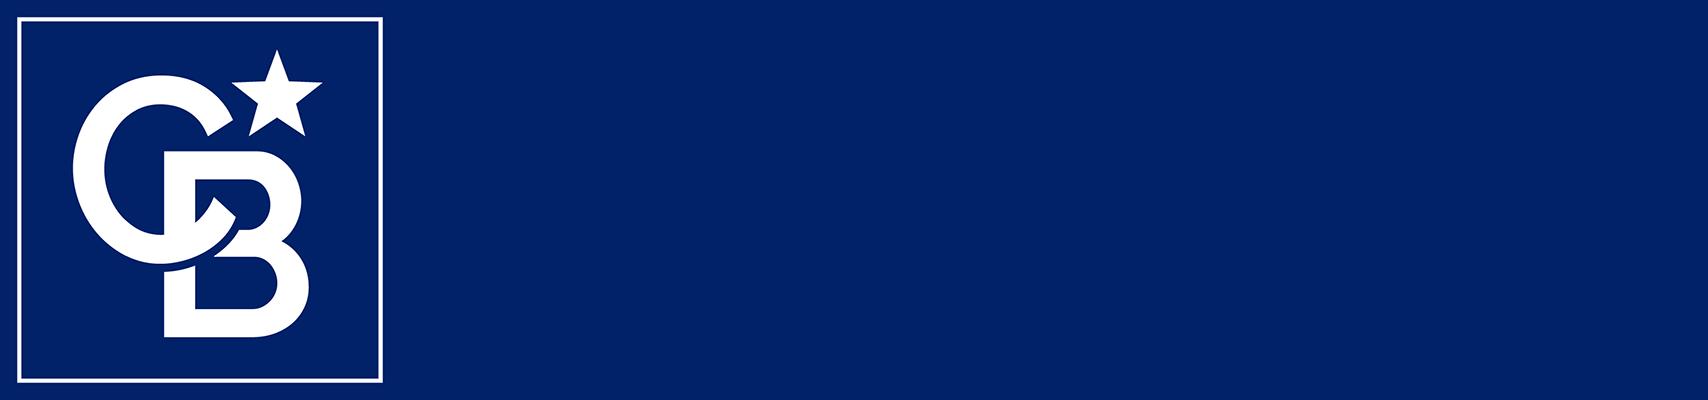 Meghan Johnson - Coldwell Banker Select Logo